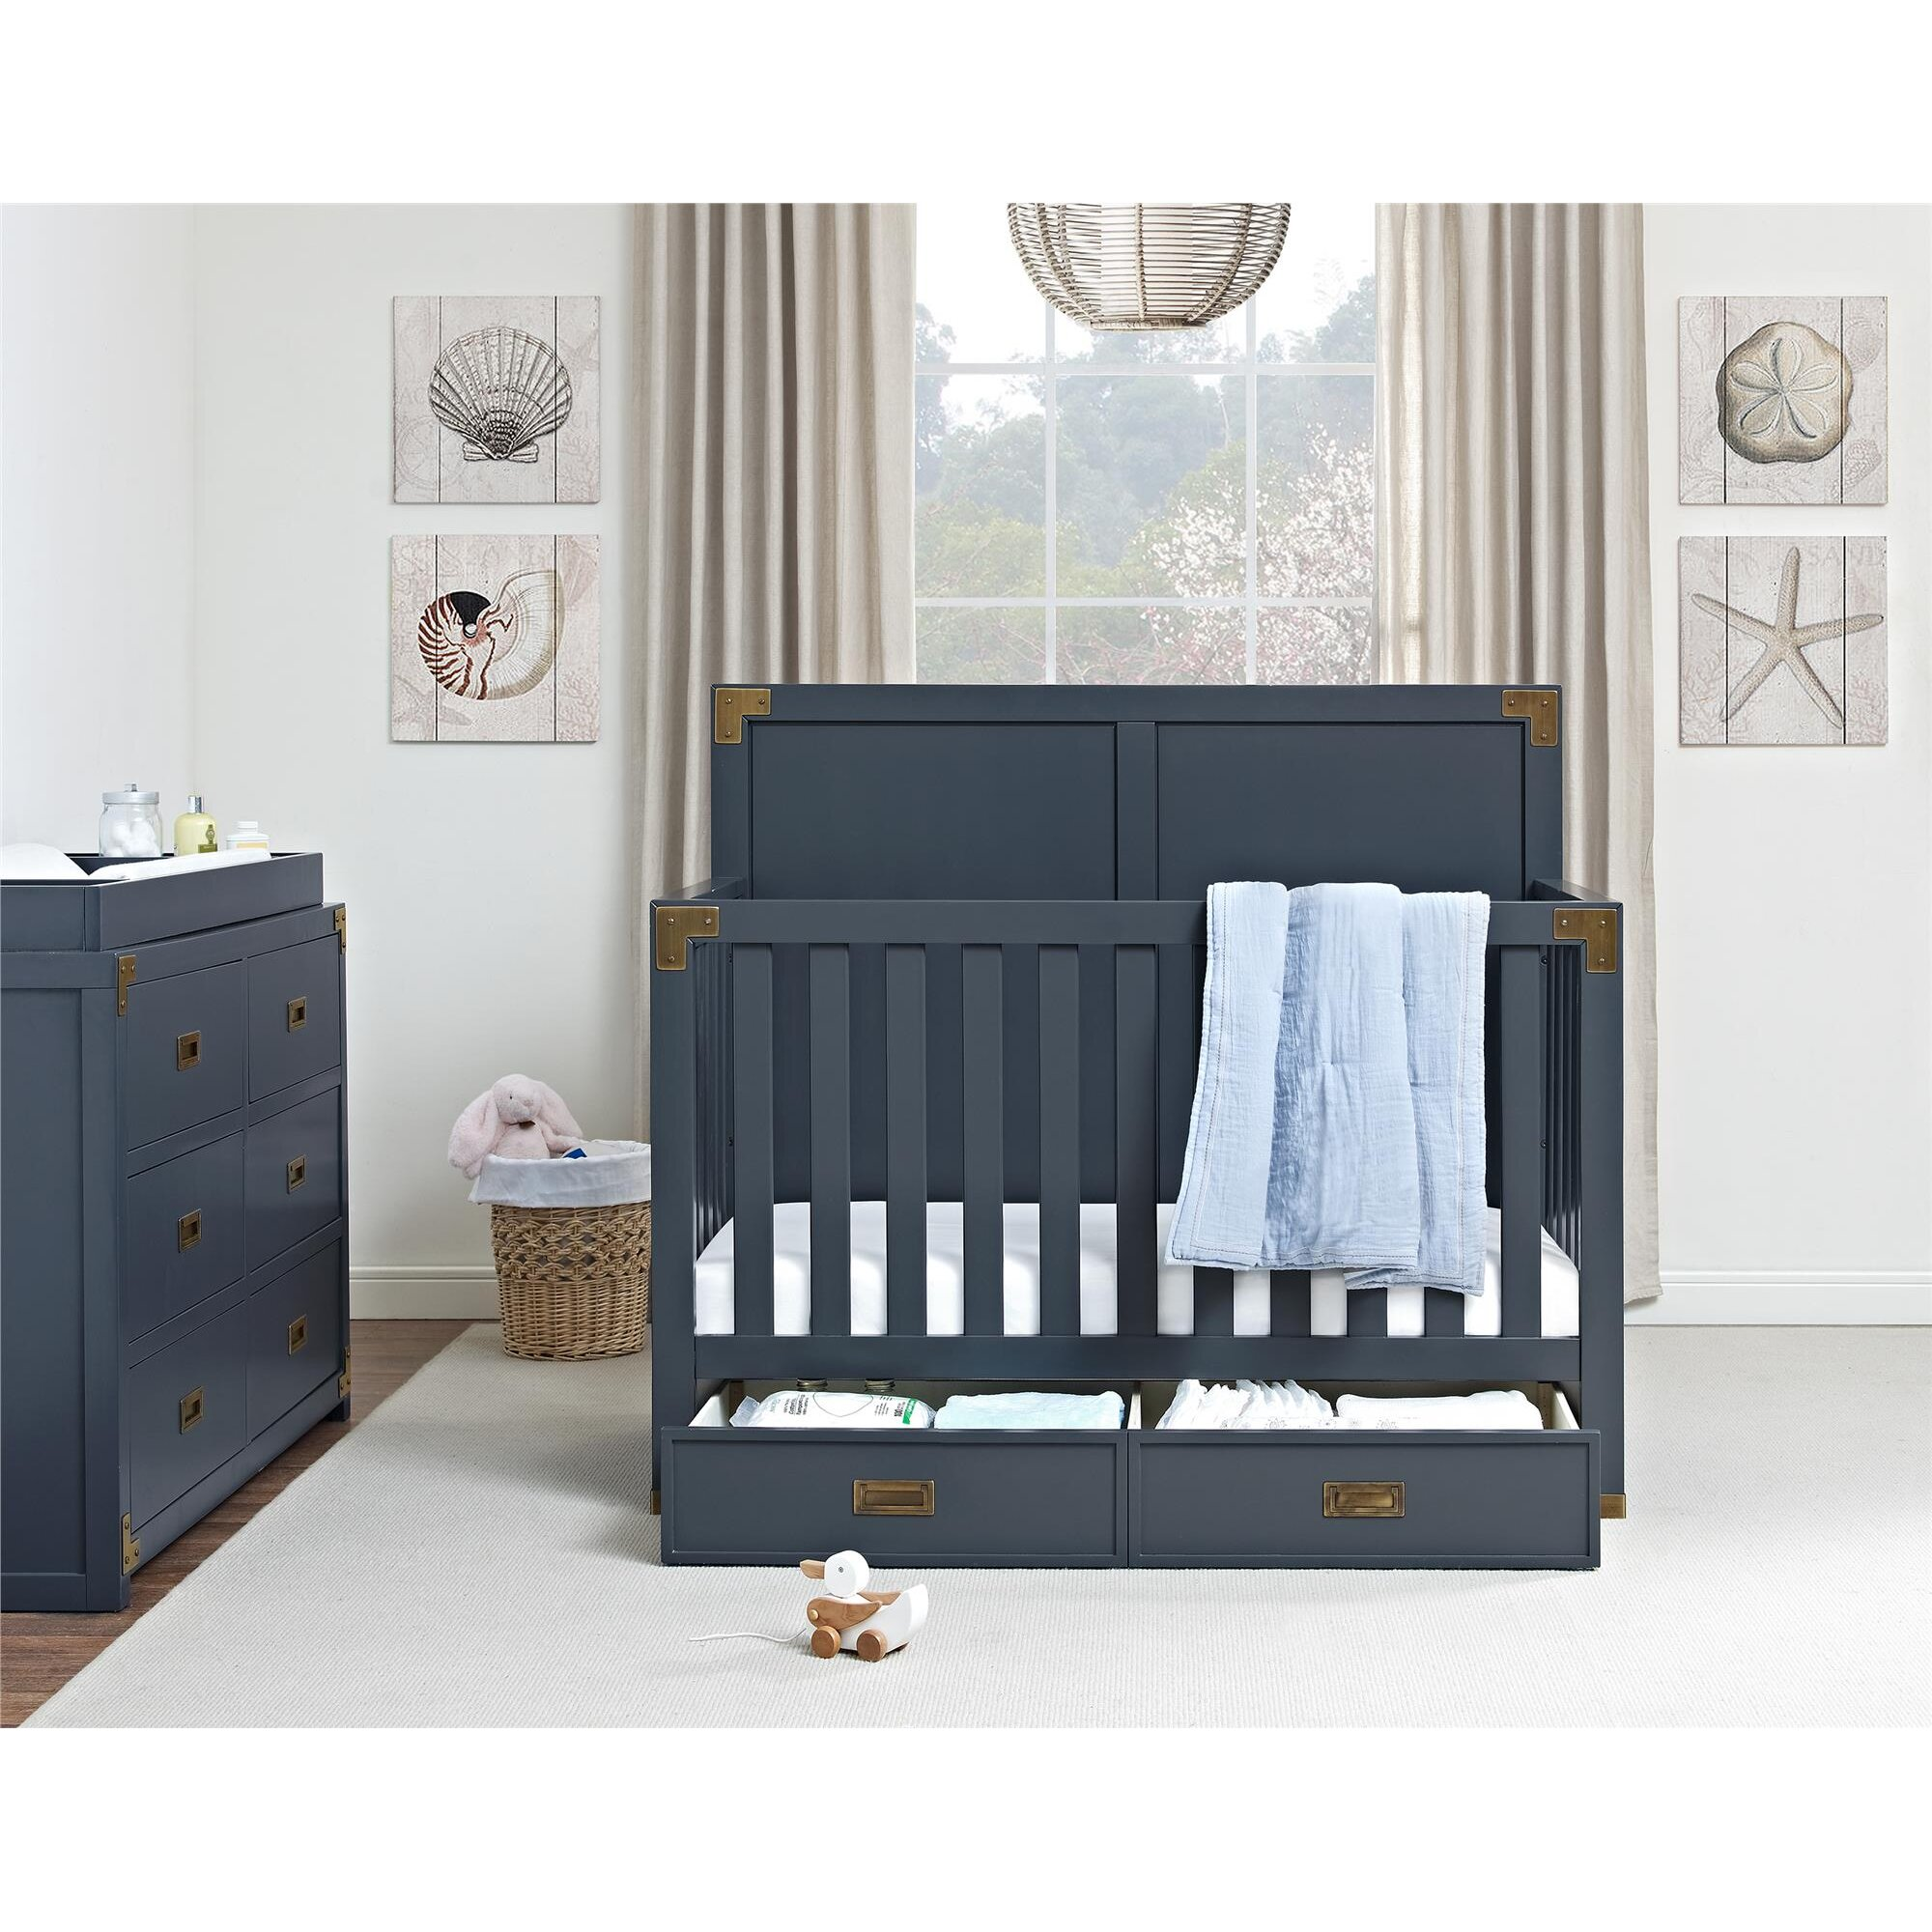 Baby cribs jacksonville fl - Viv Rae Trade Agustos 4 In 1 Convertible Crib